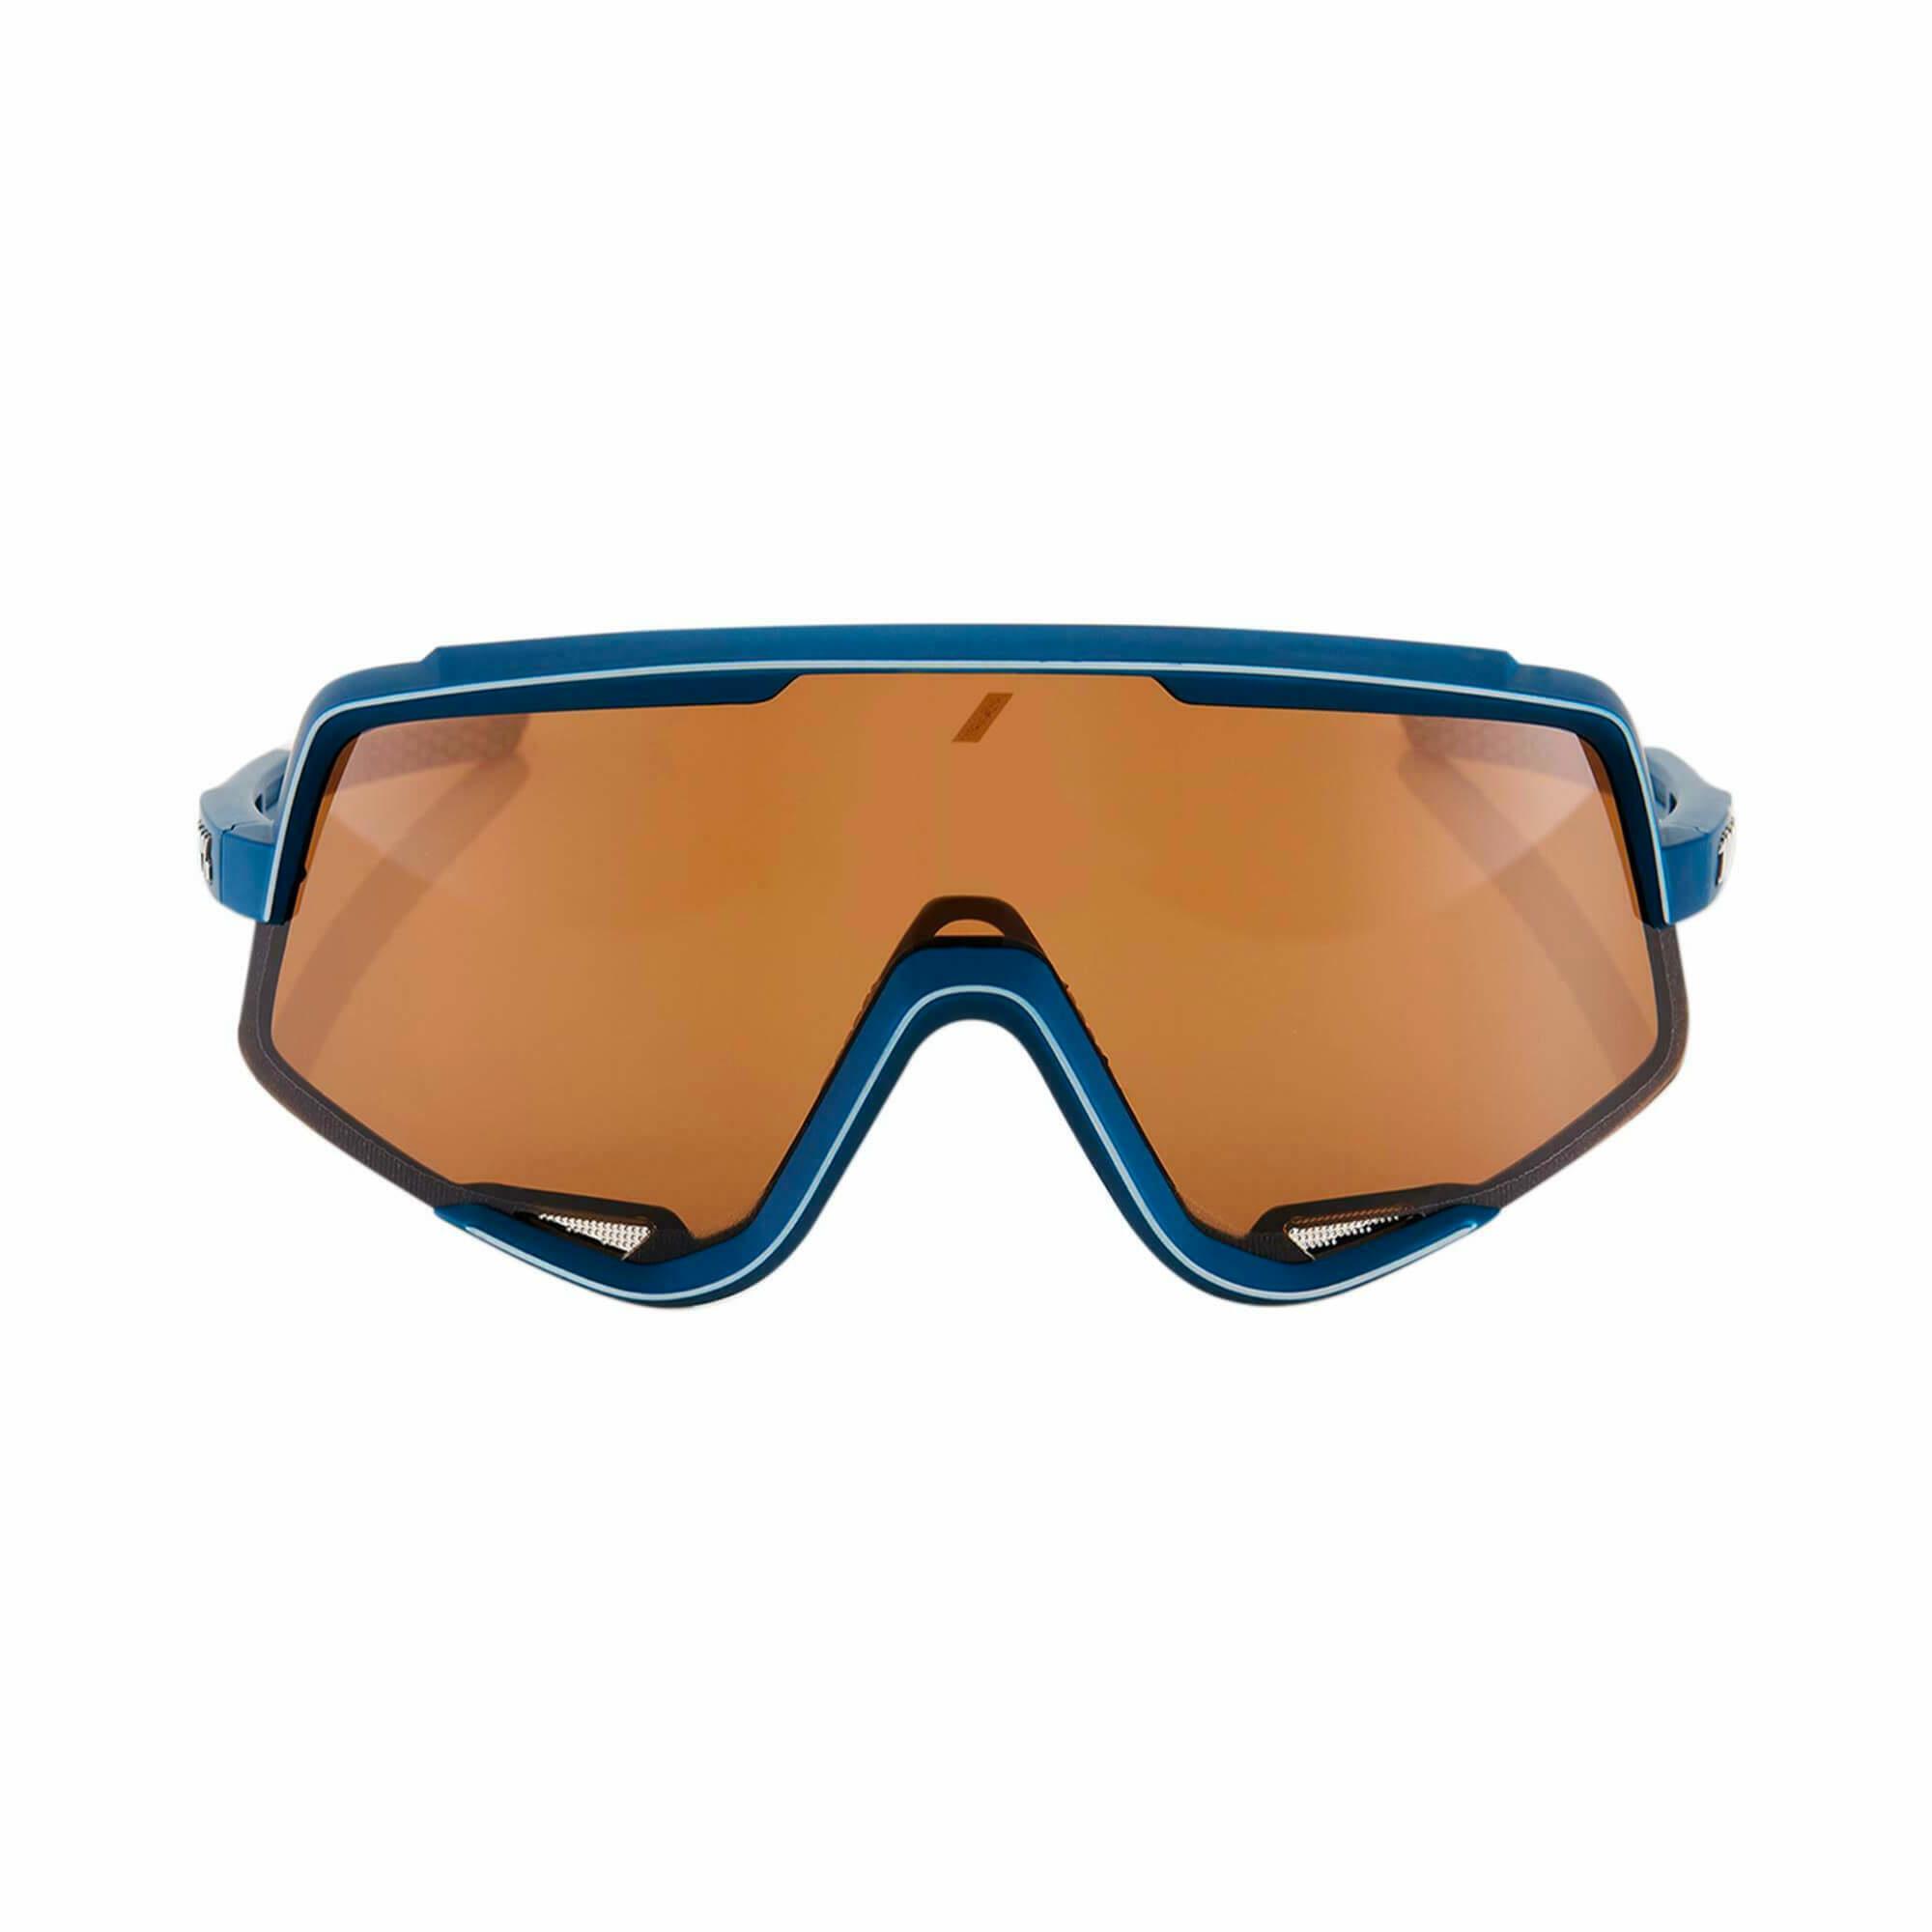 Glendale Soft Tact Raw Bronze Lens-2